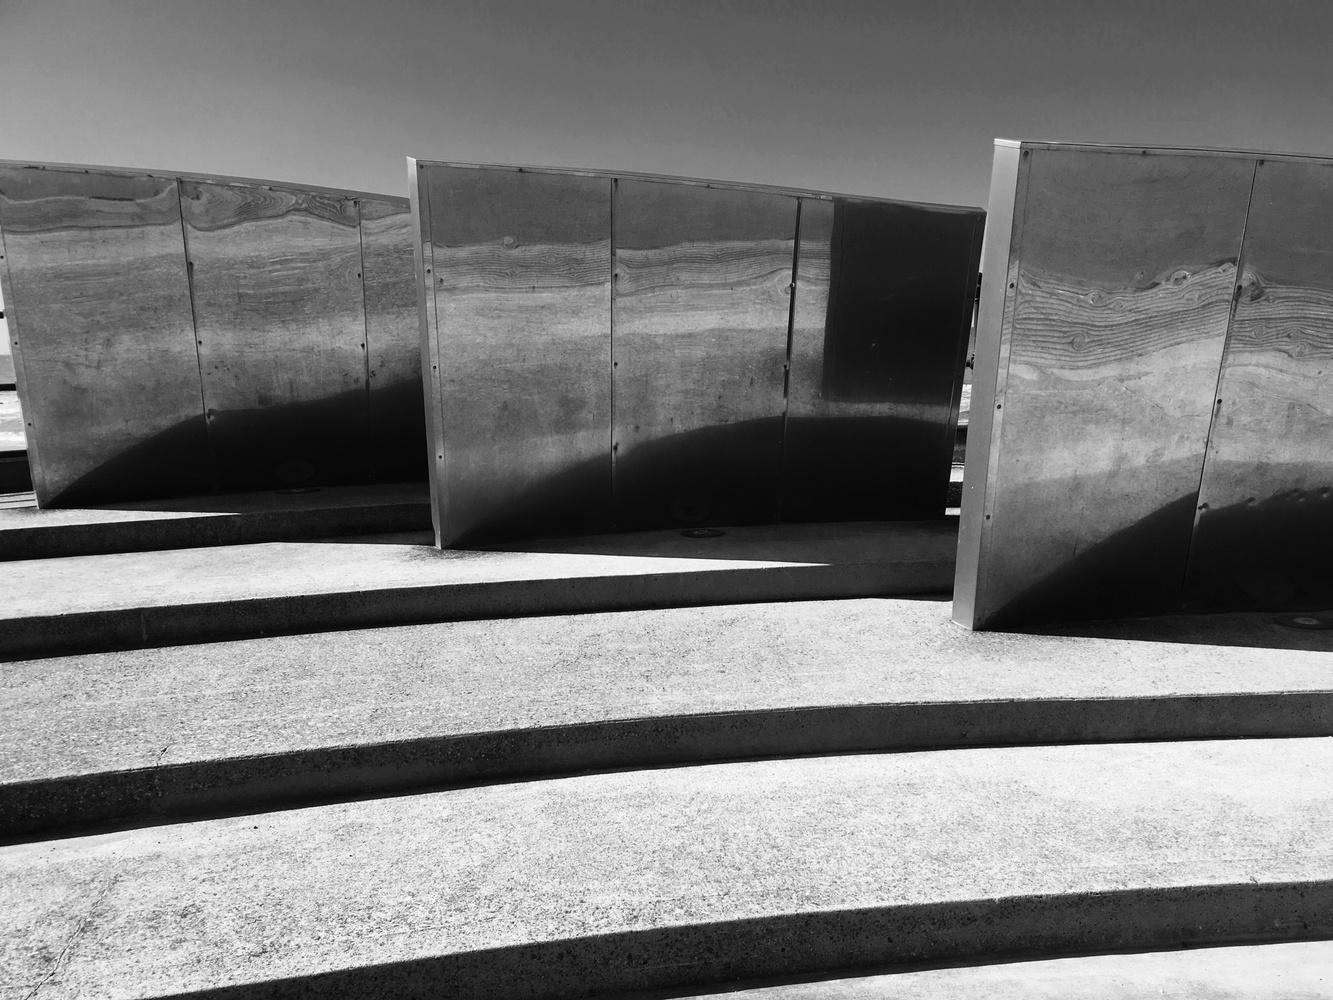 Beyond the beach by Sarah Roberts